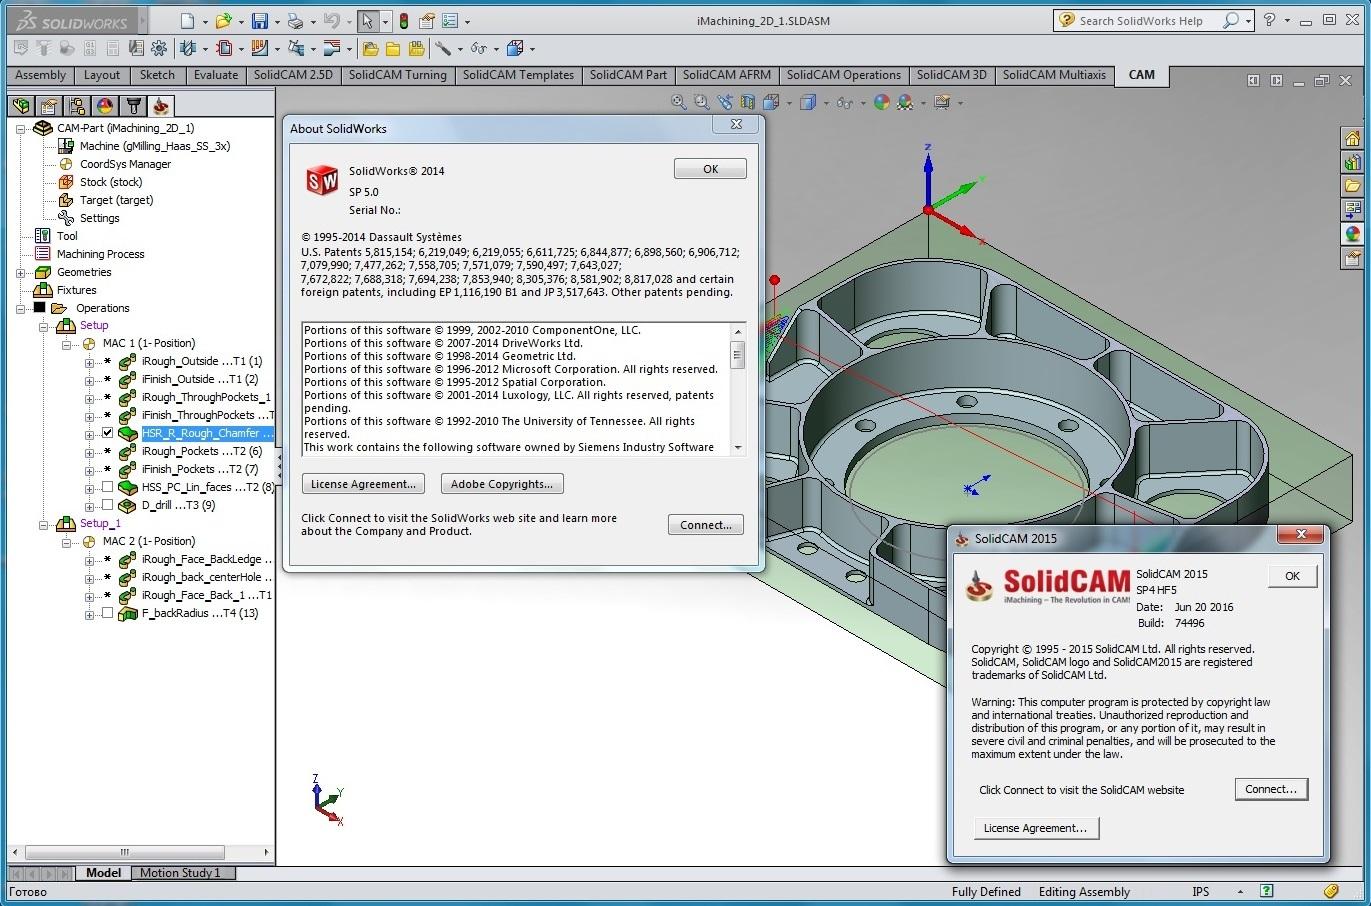 SolidCAM 2015 SP4 HF5 Multilang for SolidWorks 2012-2017 full